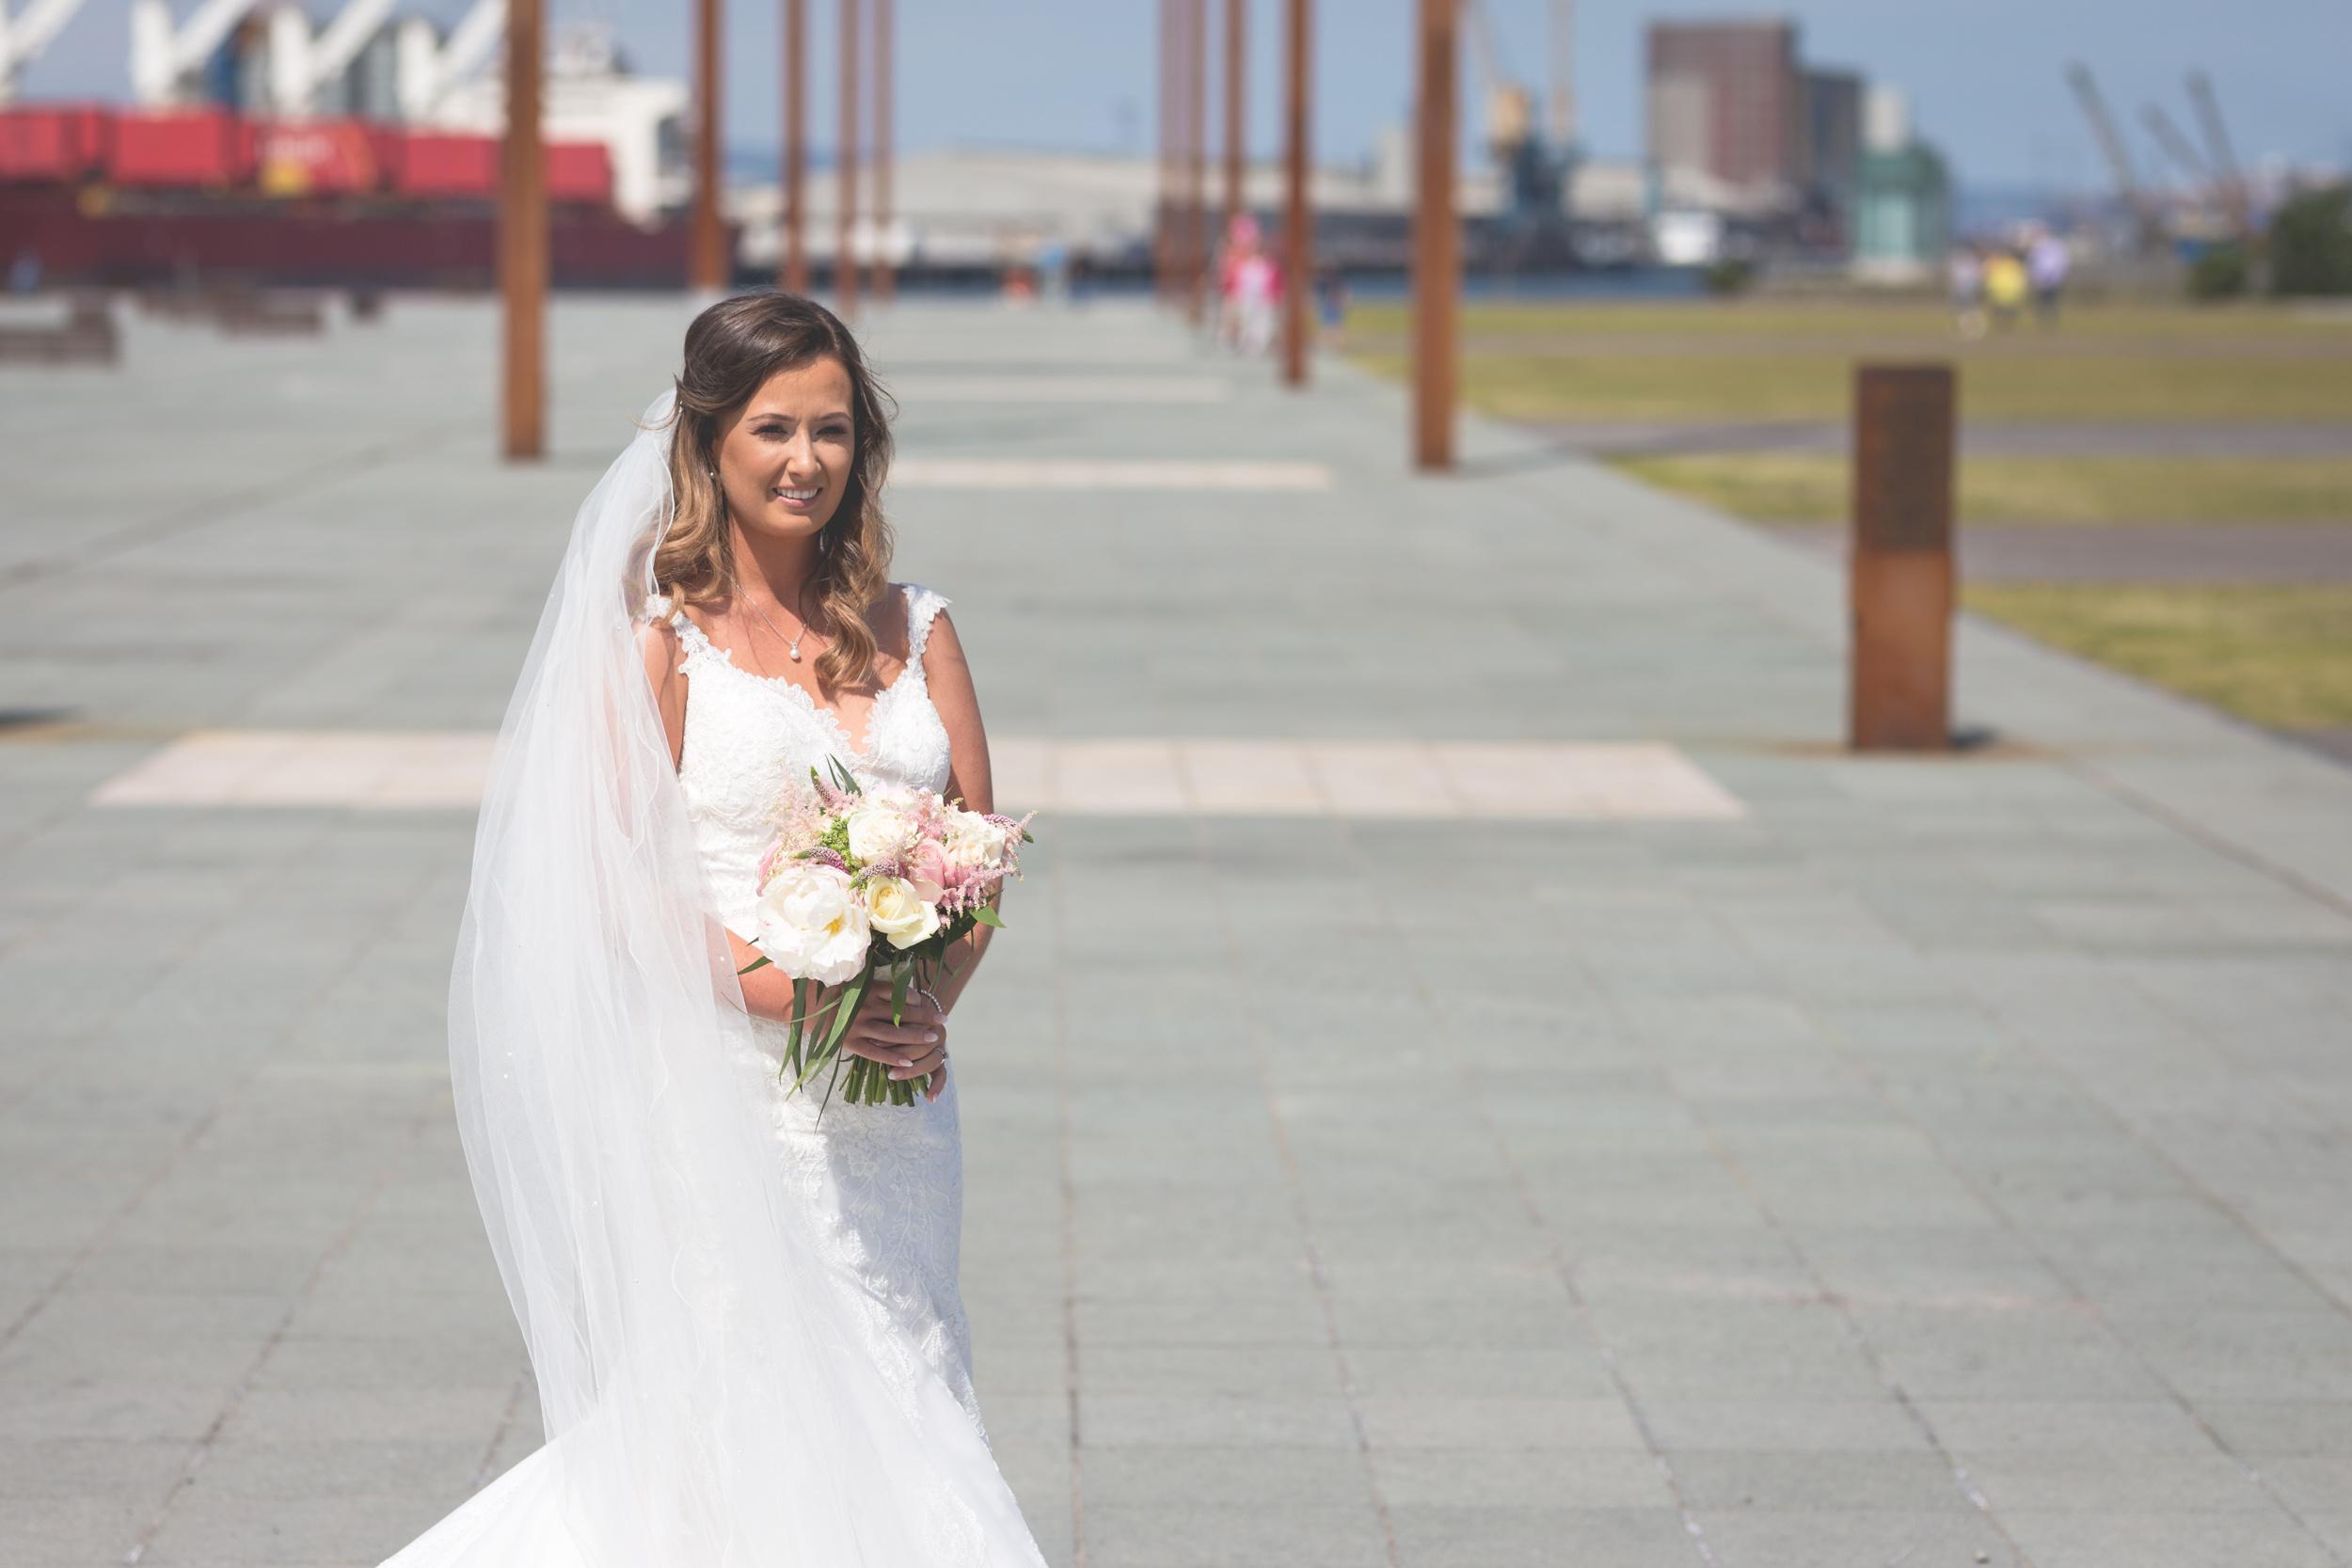 Brian McEwan   Northern Ireland Wedding Photographer   Rebecca & Michael   Portraits-45.jpg